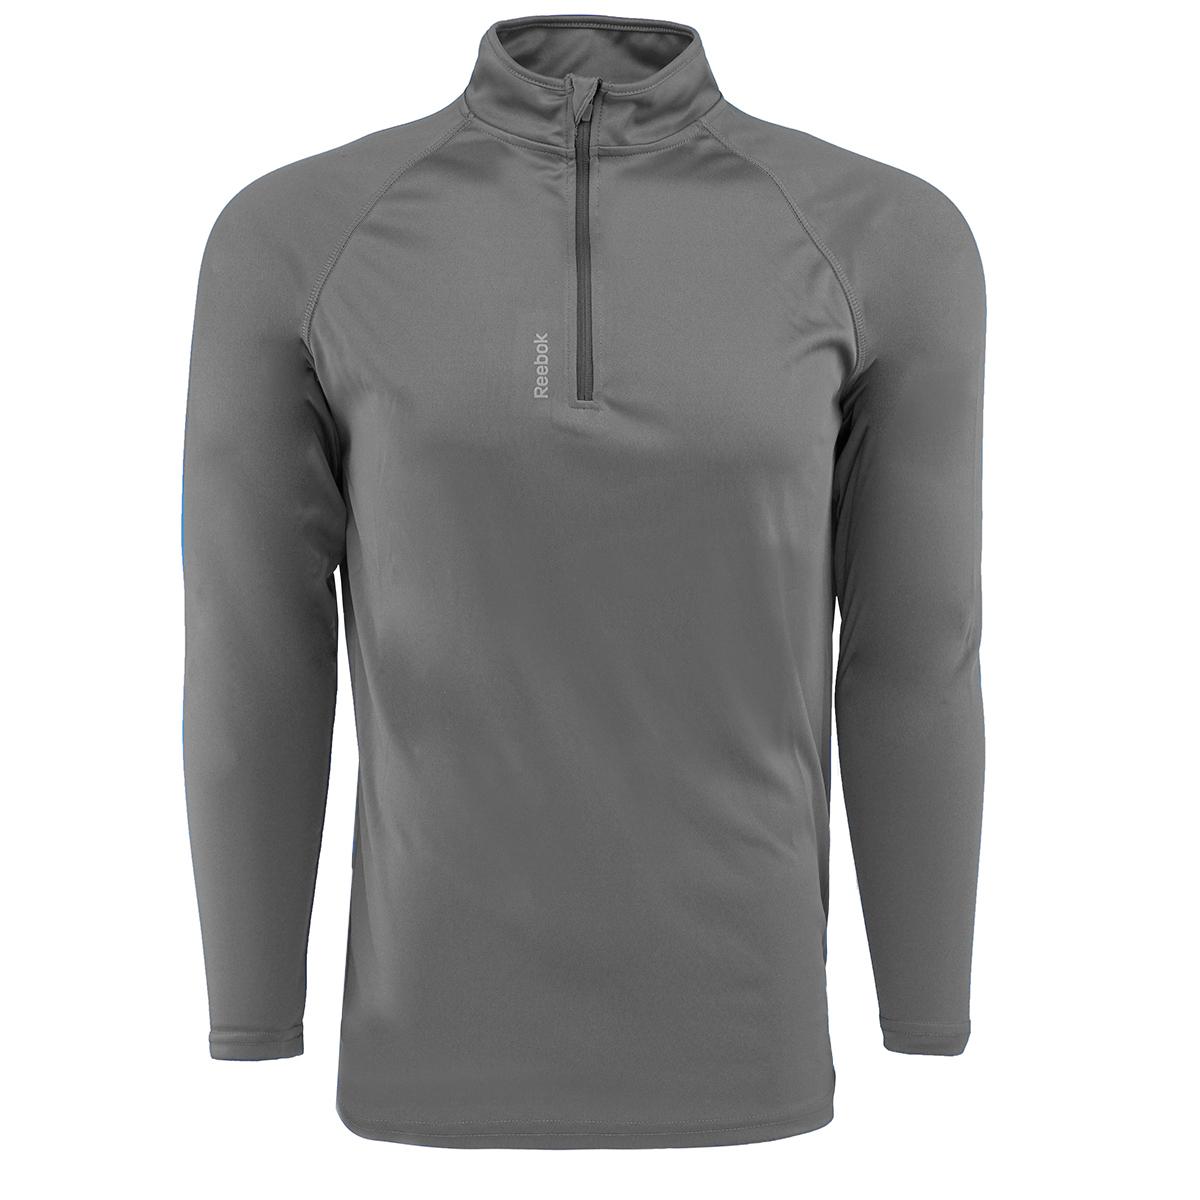 Reebok-Men-039-s-Play-Dry-1-4-Zip-Jacket